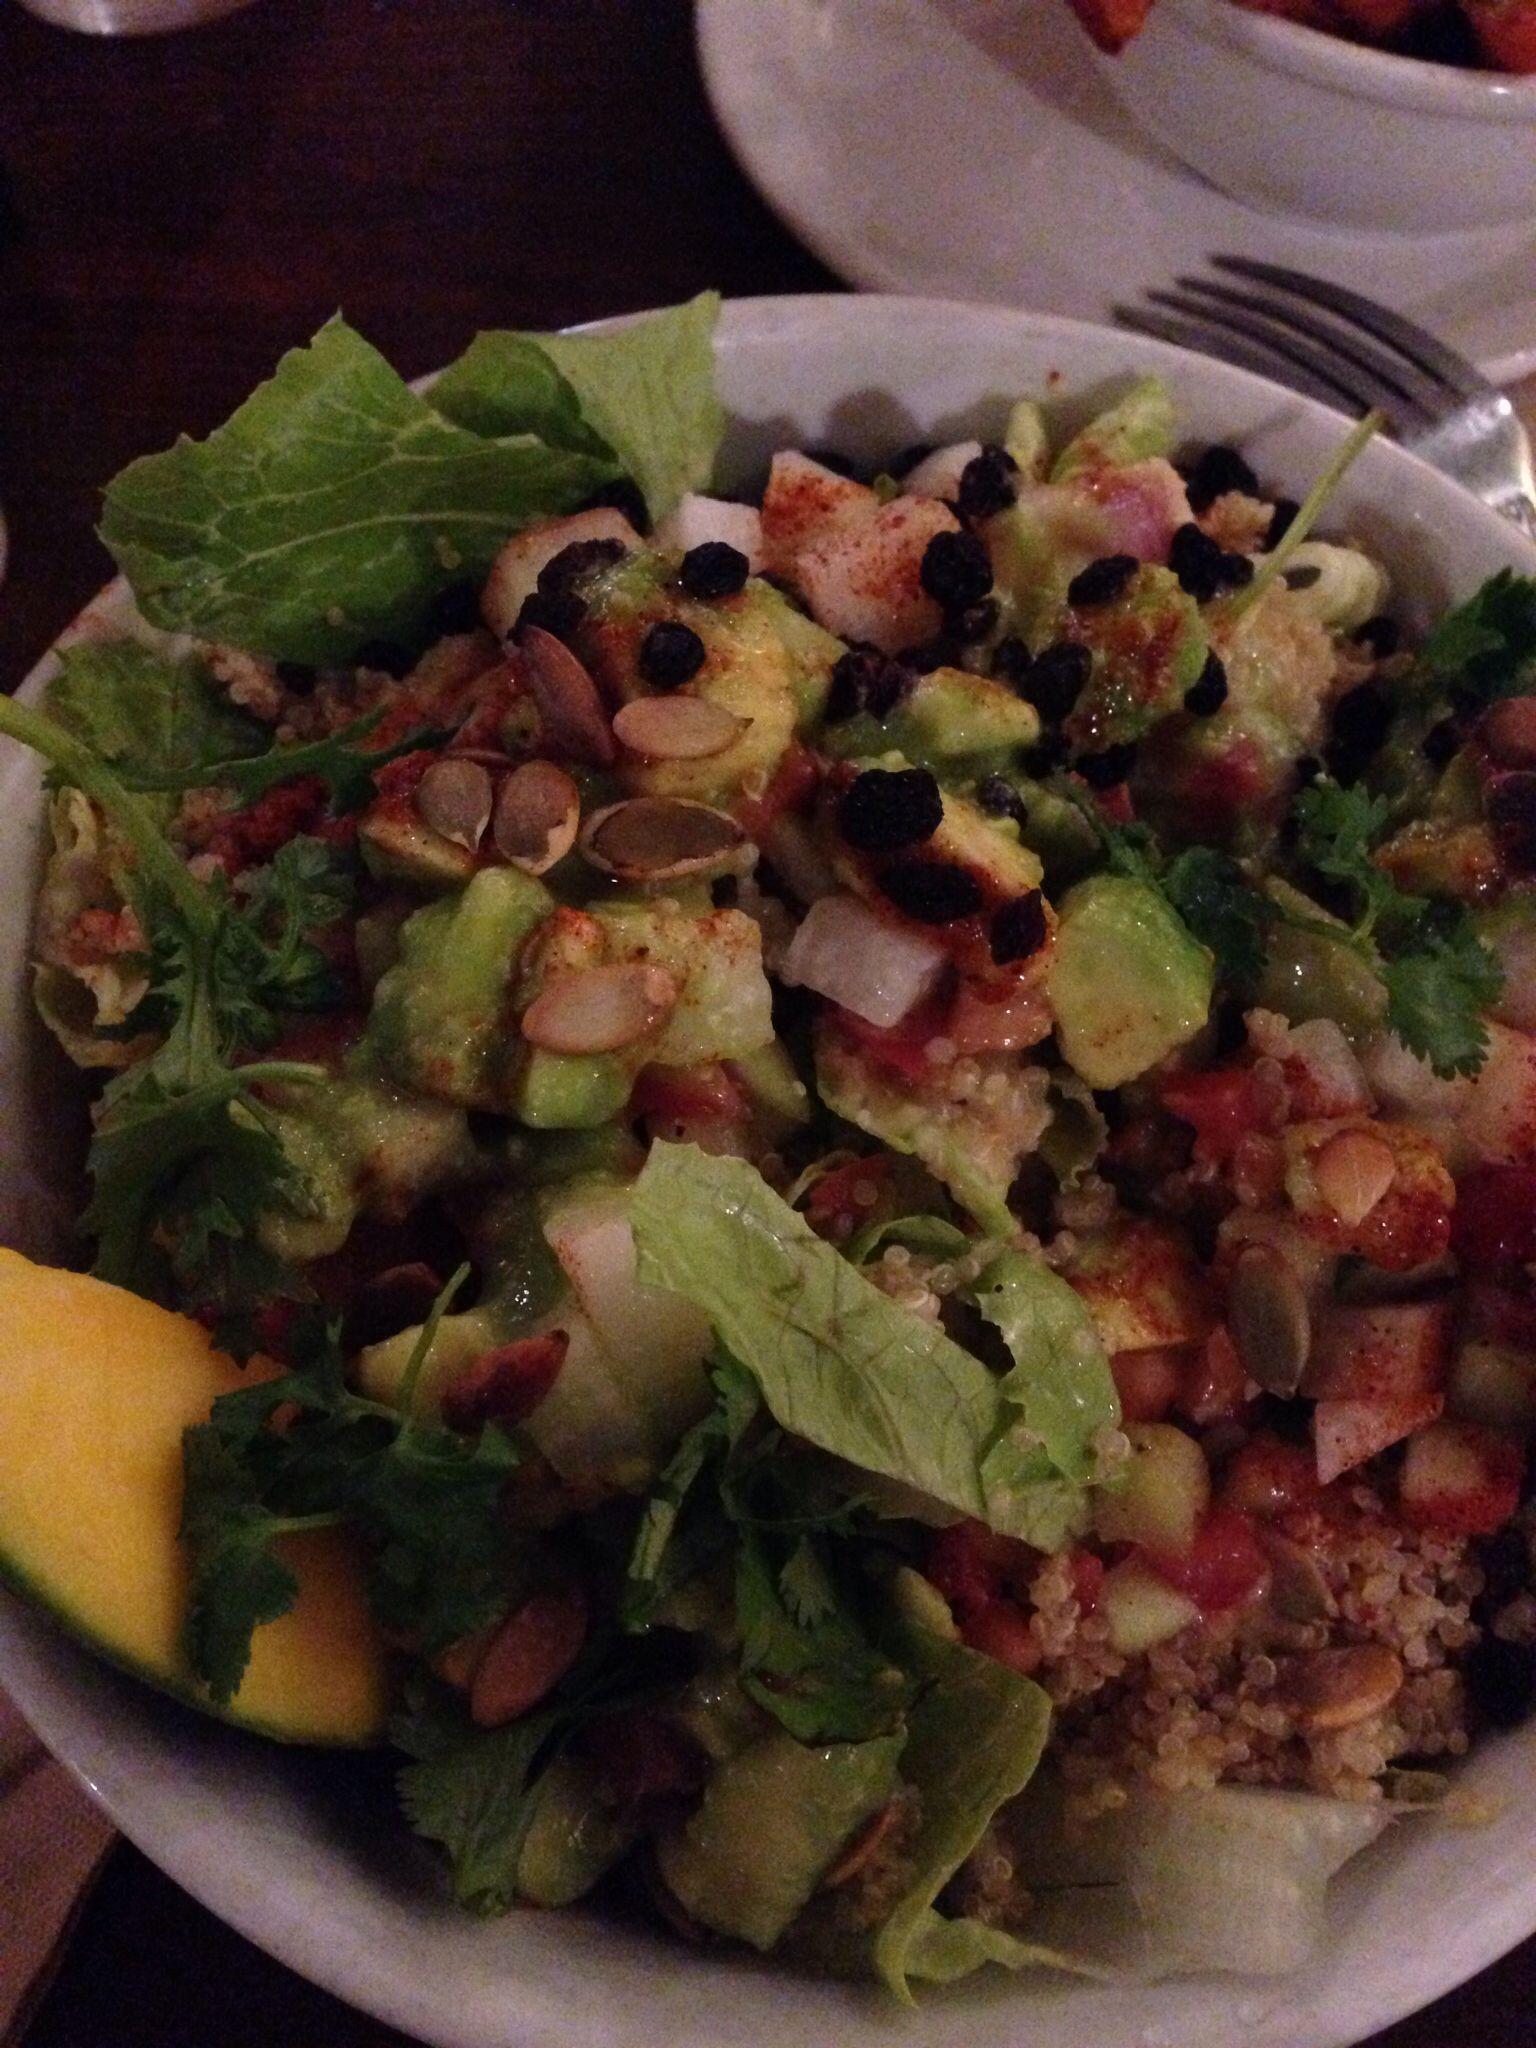 Ensalada Azteca salad from native foods